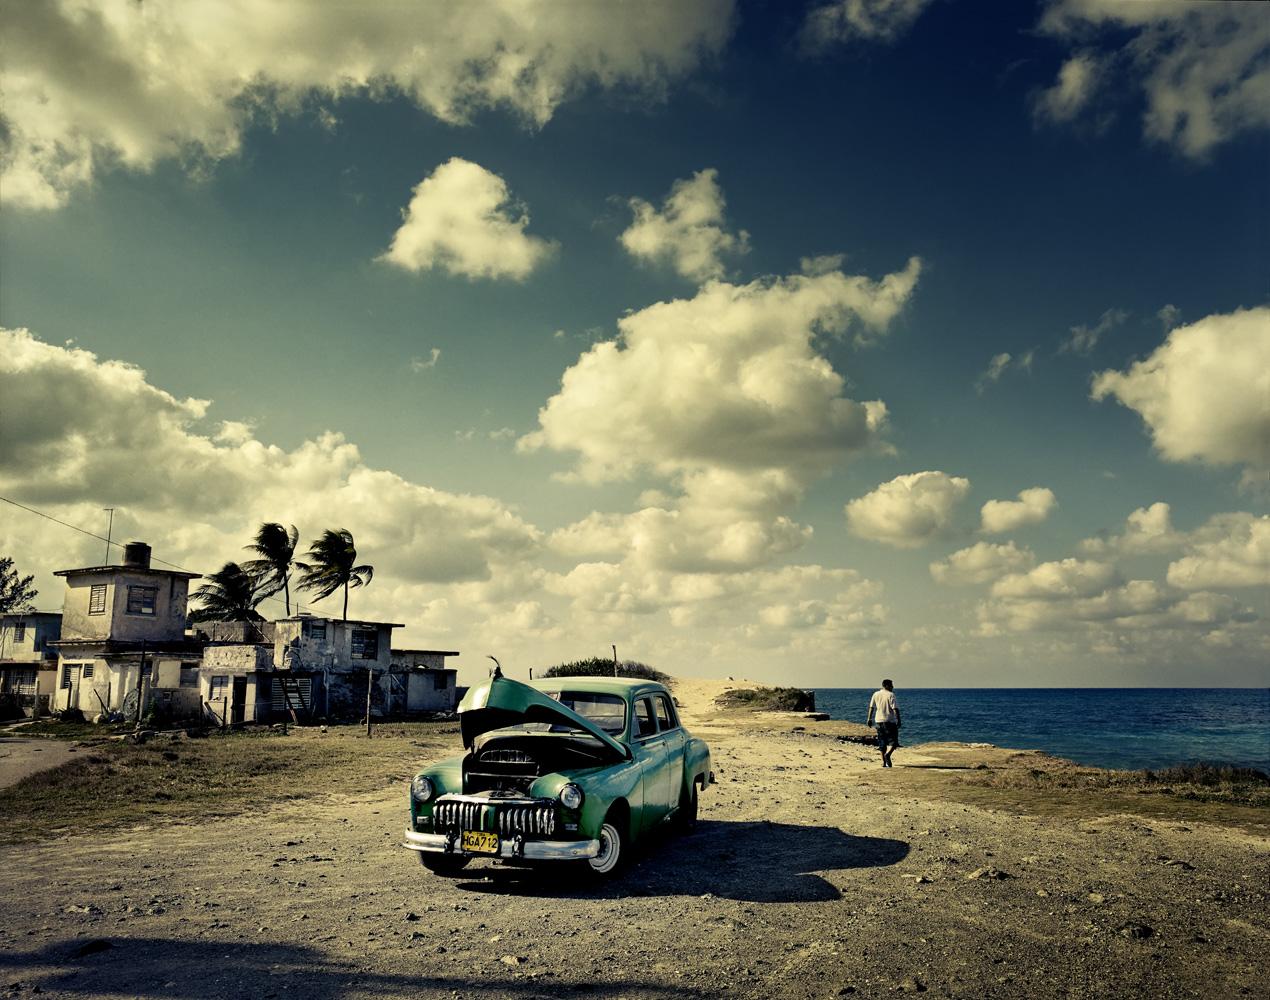 March 7, 2013. An old American car, long a staple of Cuban roads, sits along Guanabo Beach, near Havana, Cuba.